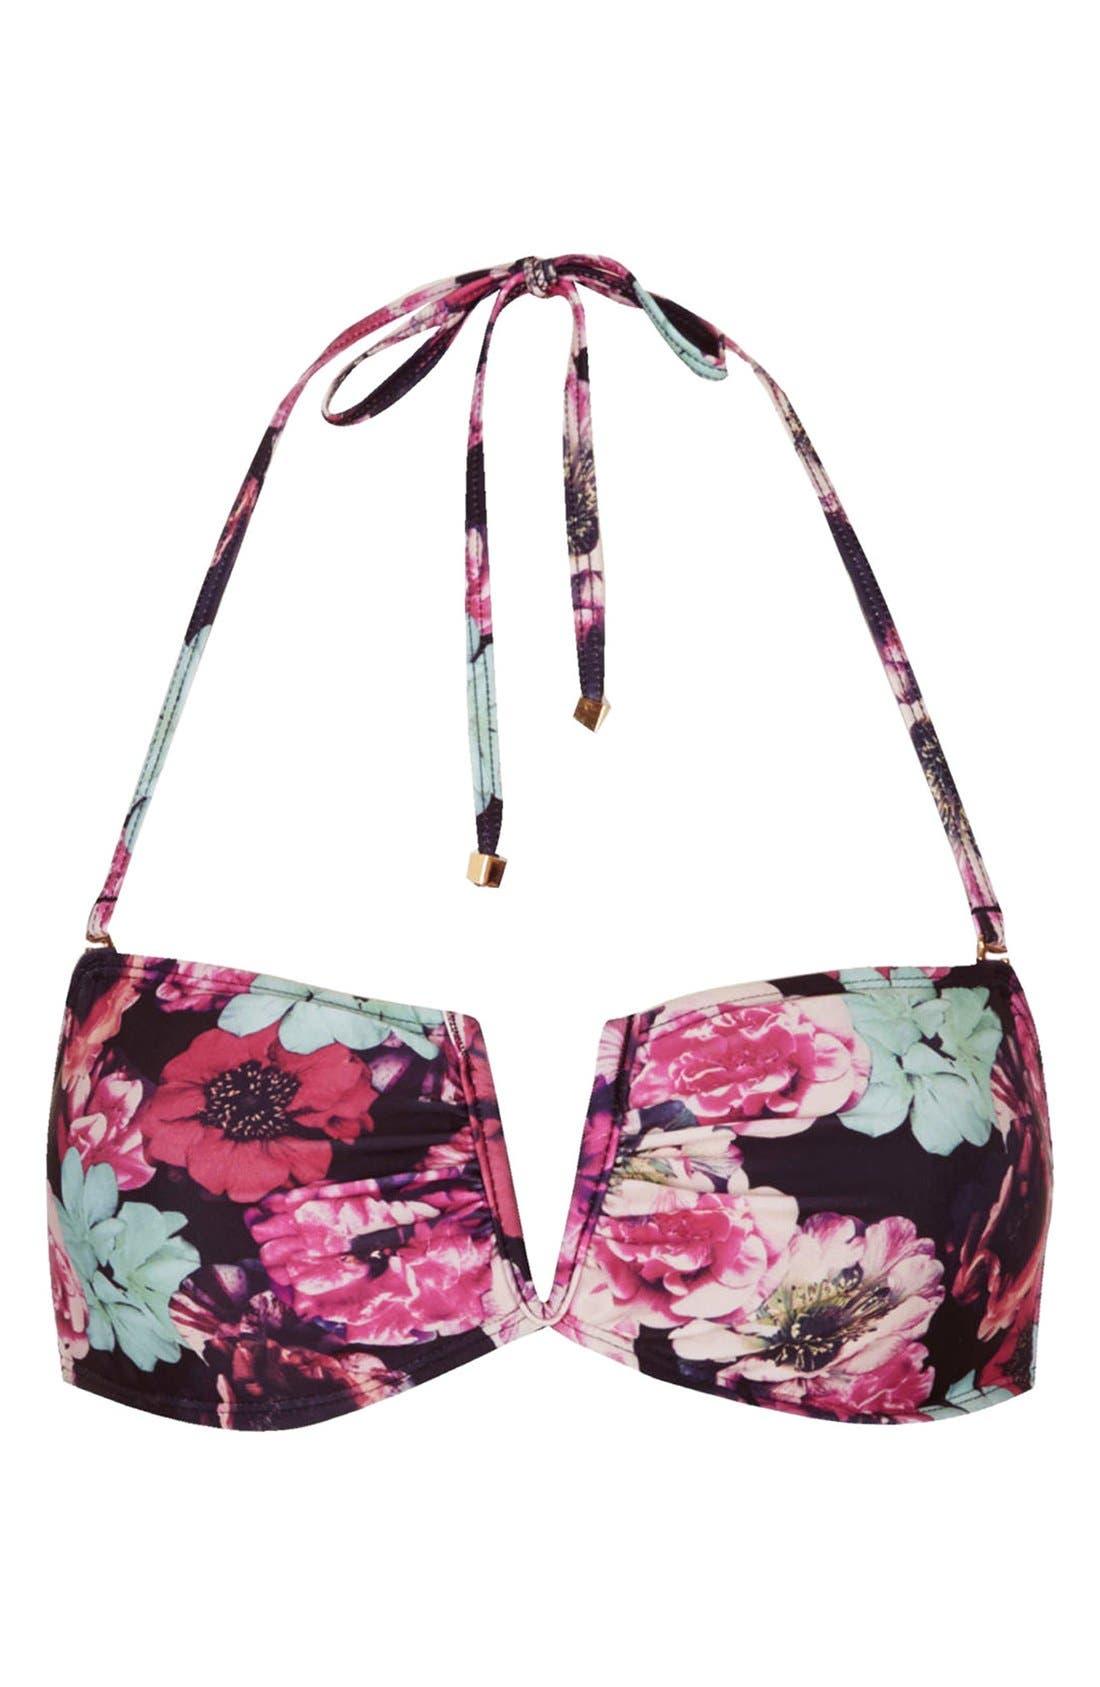 Alternate Image 1 Selected - Topshop 'Mixed Bloom' Floral Print Bandeau Bikini Top